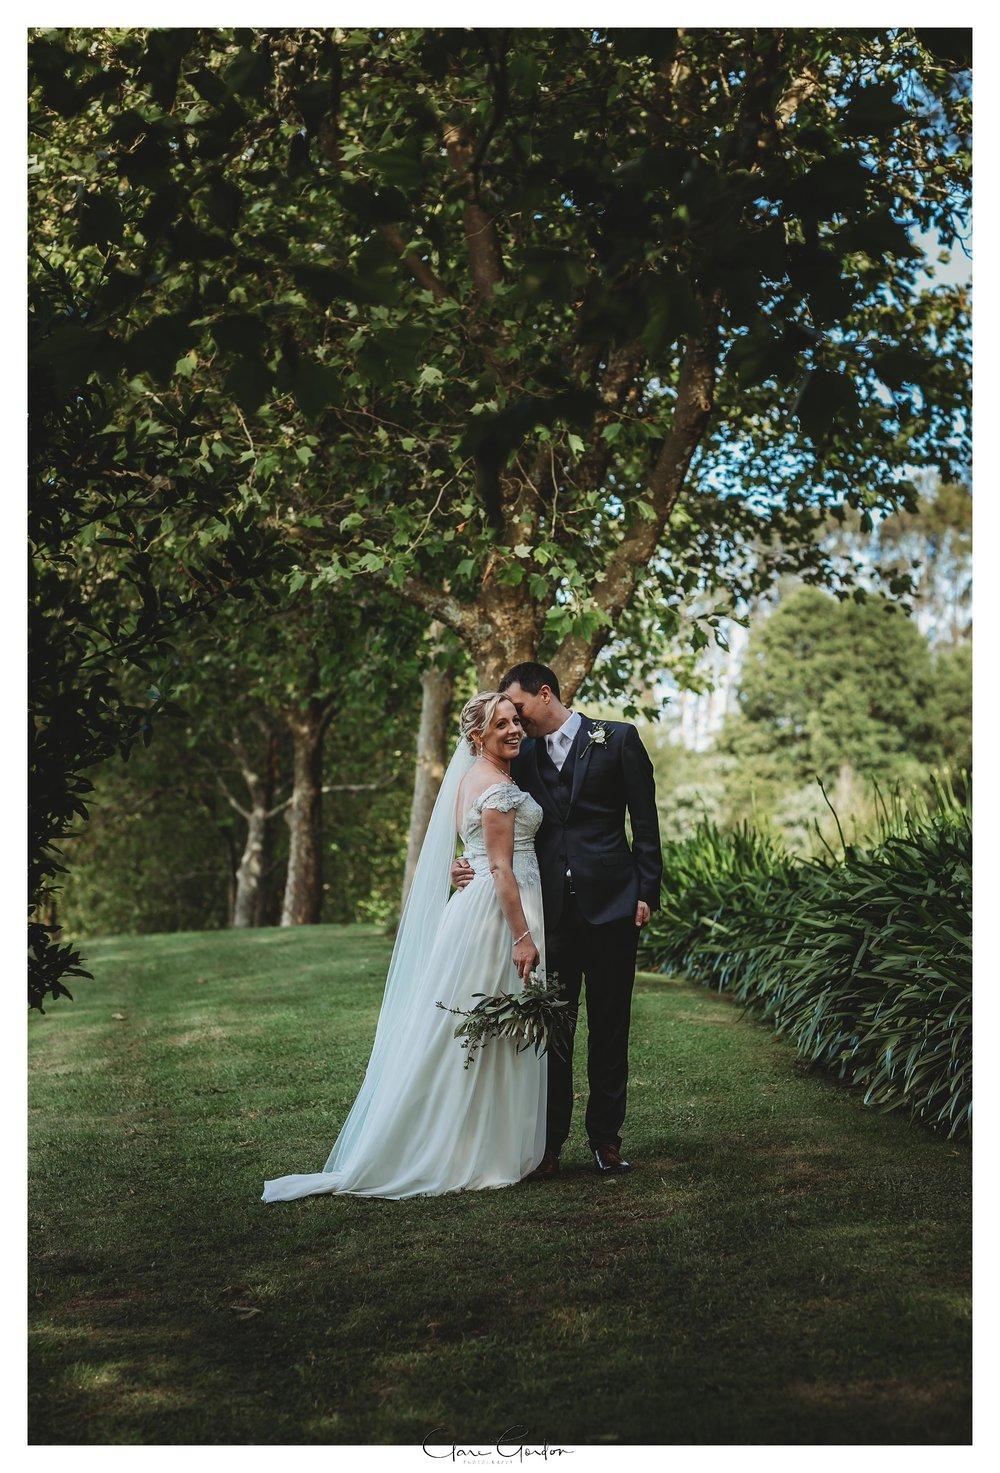 Eagle-Ridge-wedding-bride-and-groom-portrait-photo-Tauranga (158).jpg